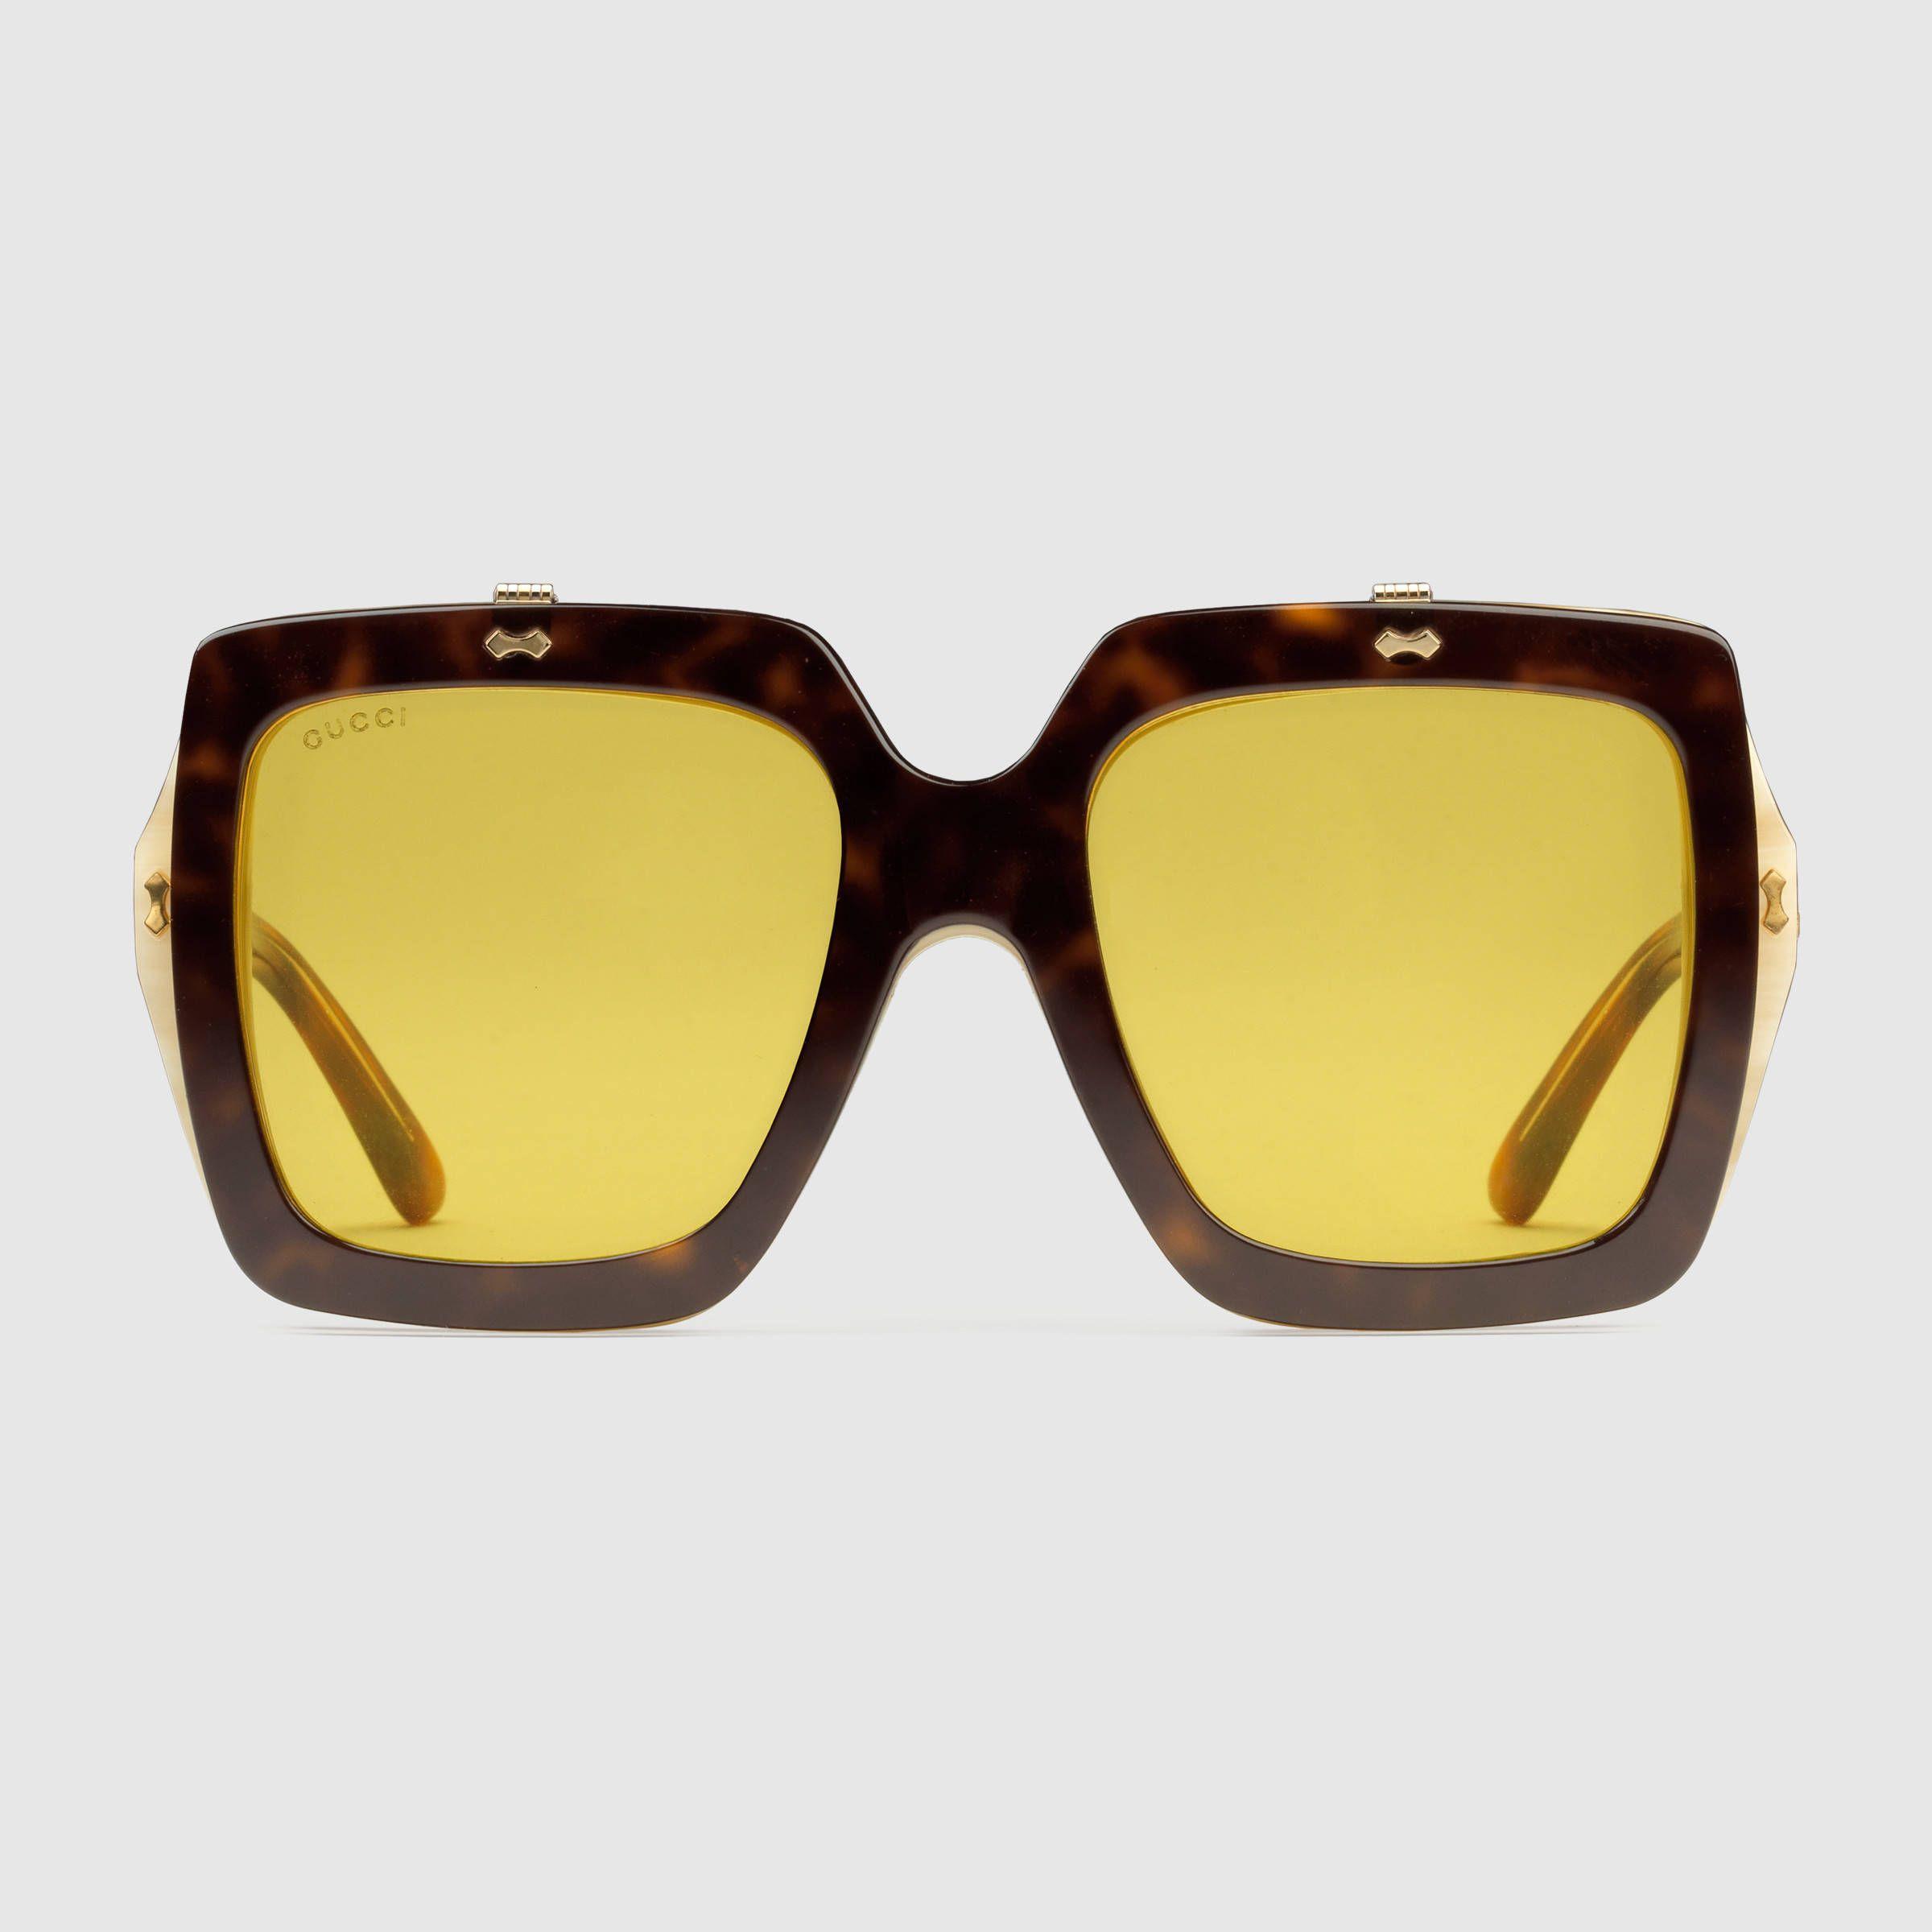 713c547e1be78 Oversize square-frame acetate sunglasses - dark tortoiseshell acetate by  Gucci